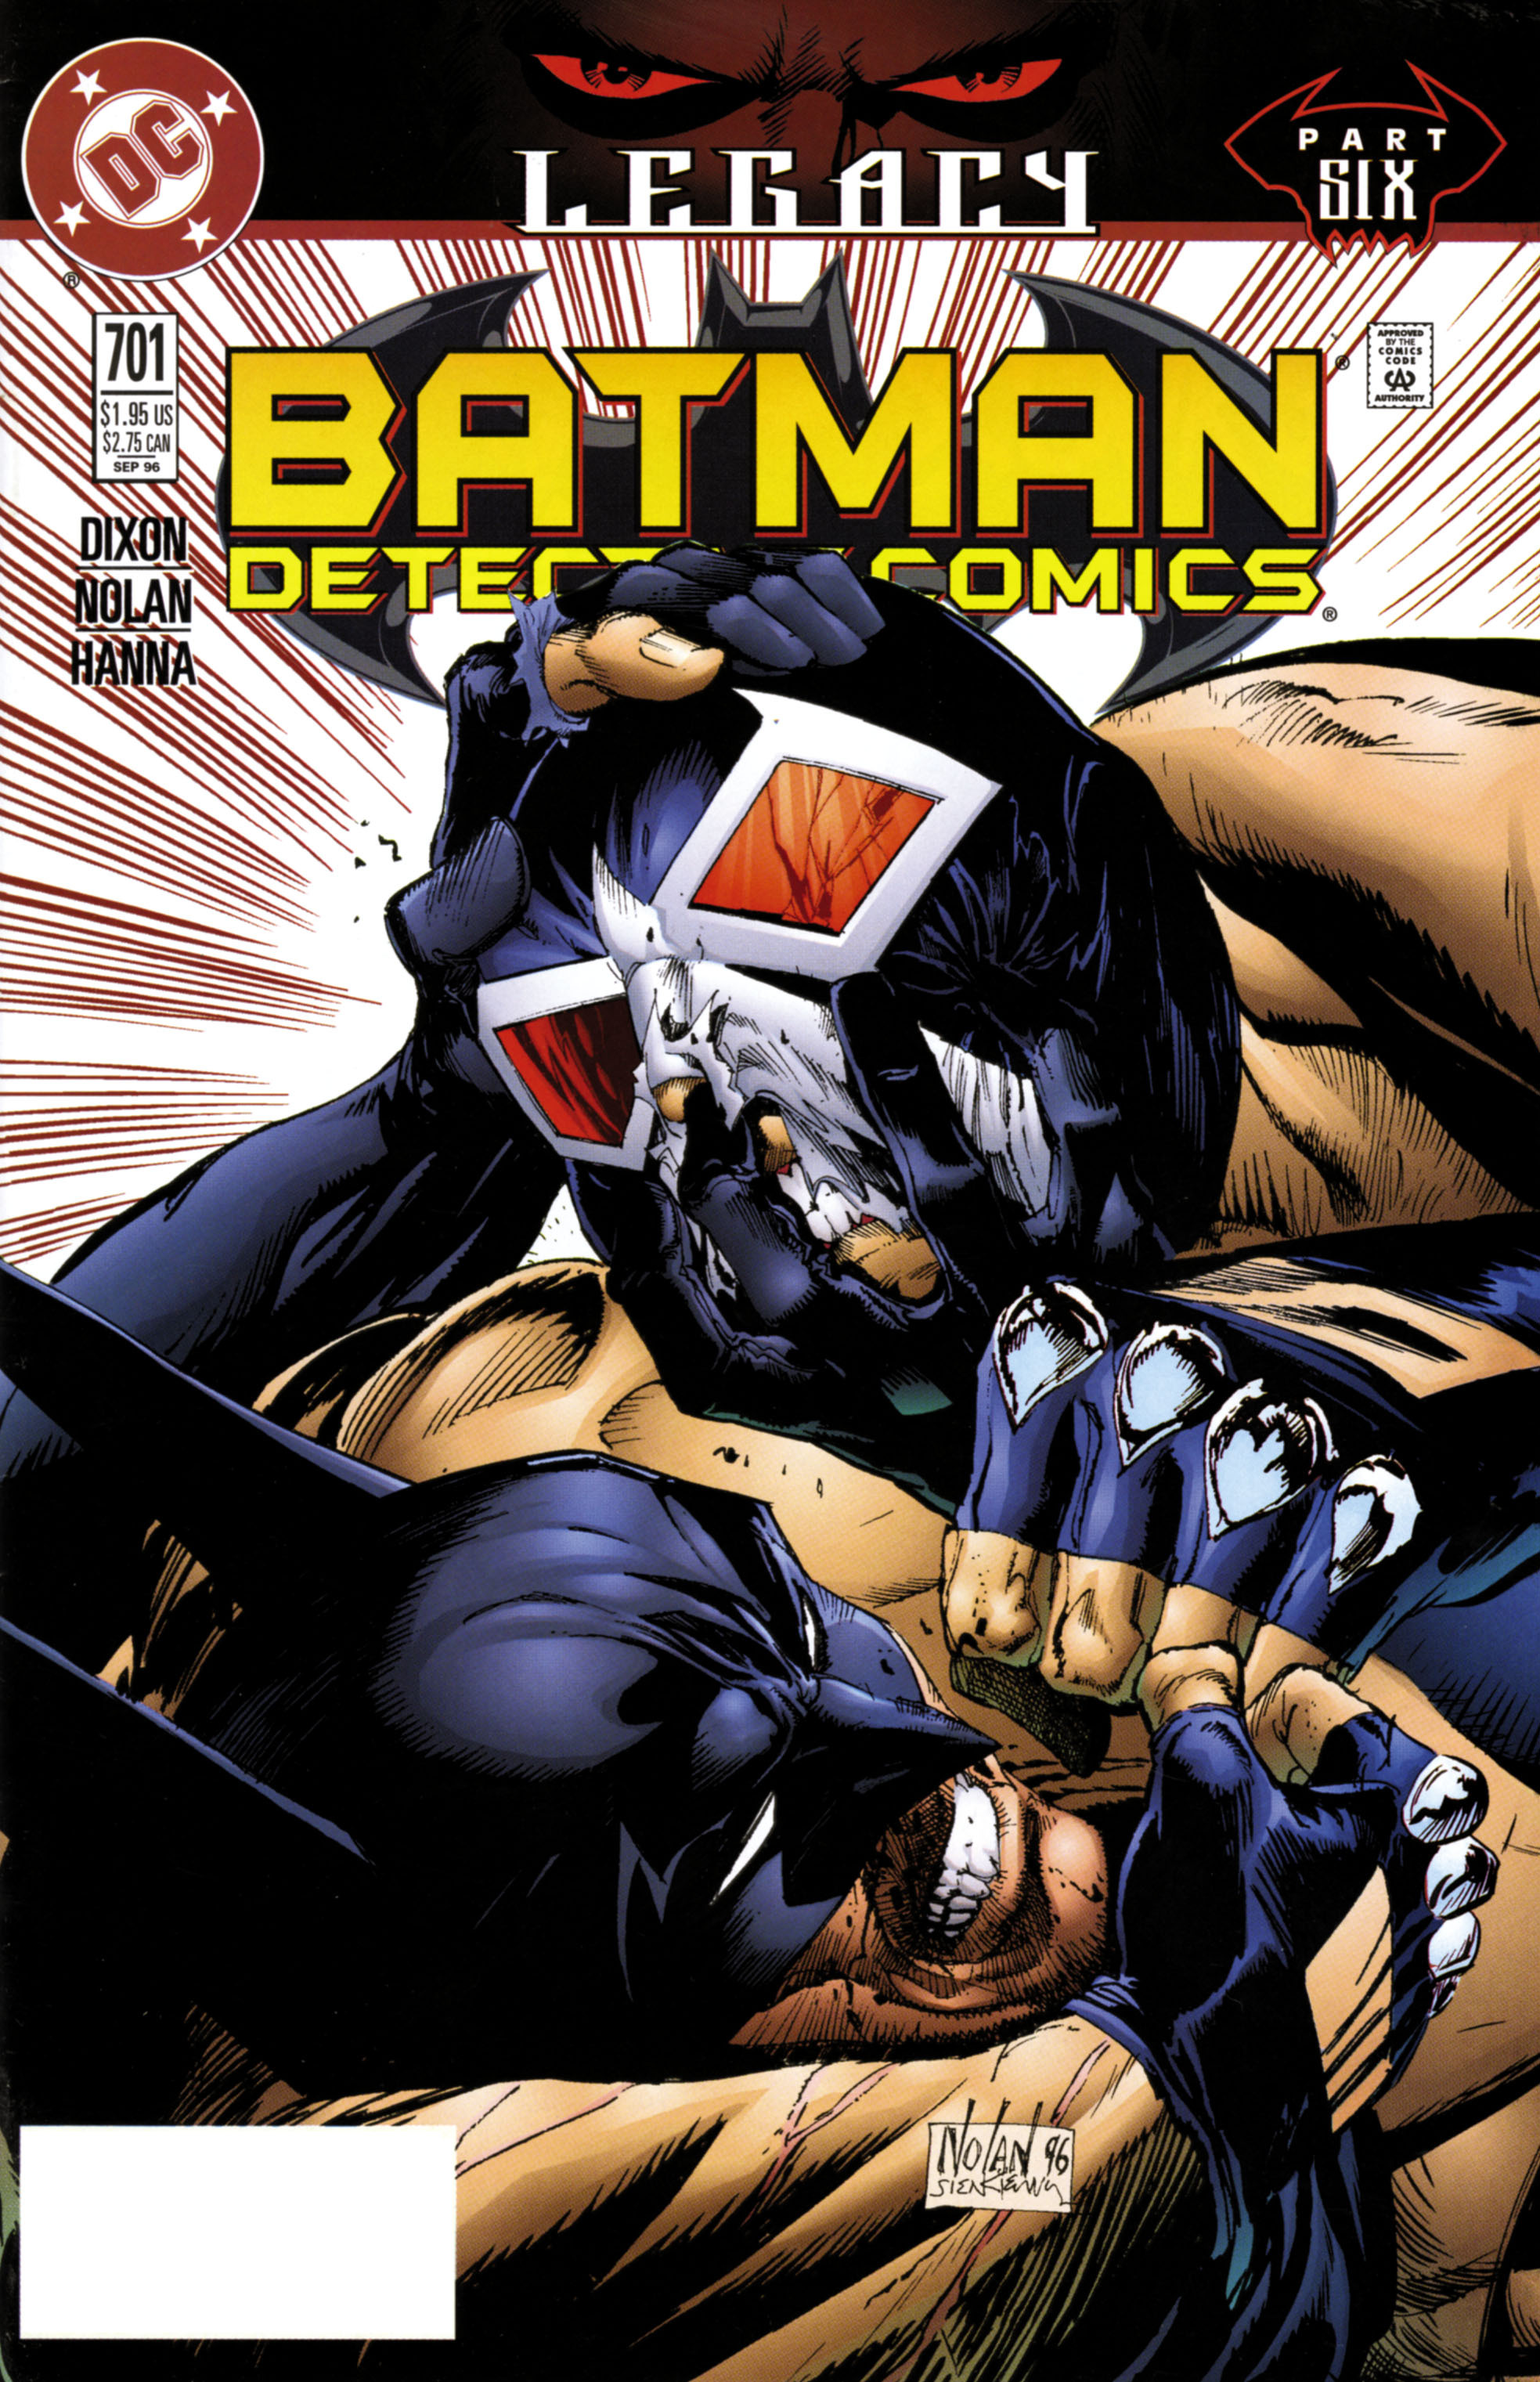 Detective Comics (1937) 701 Page 1